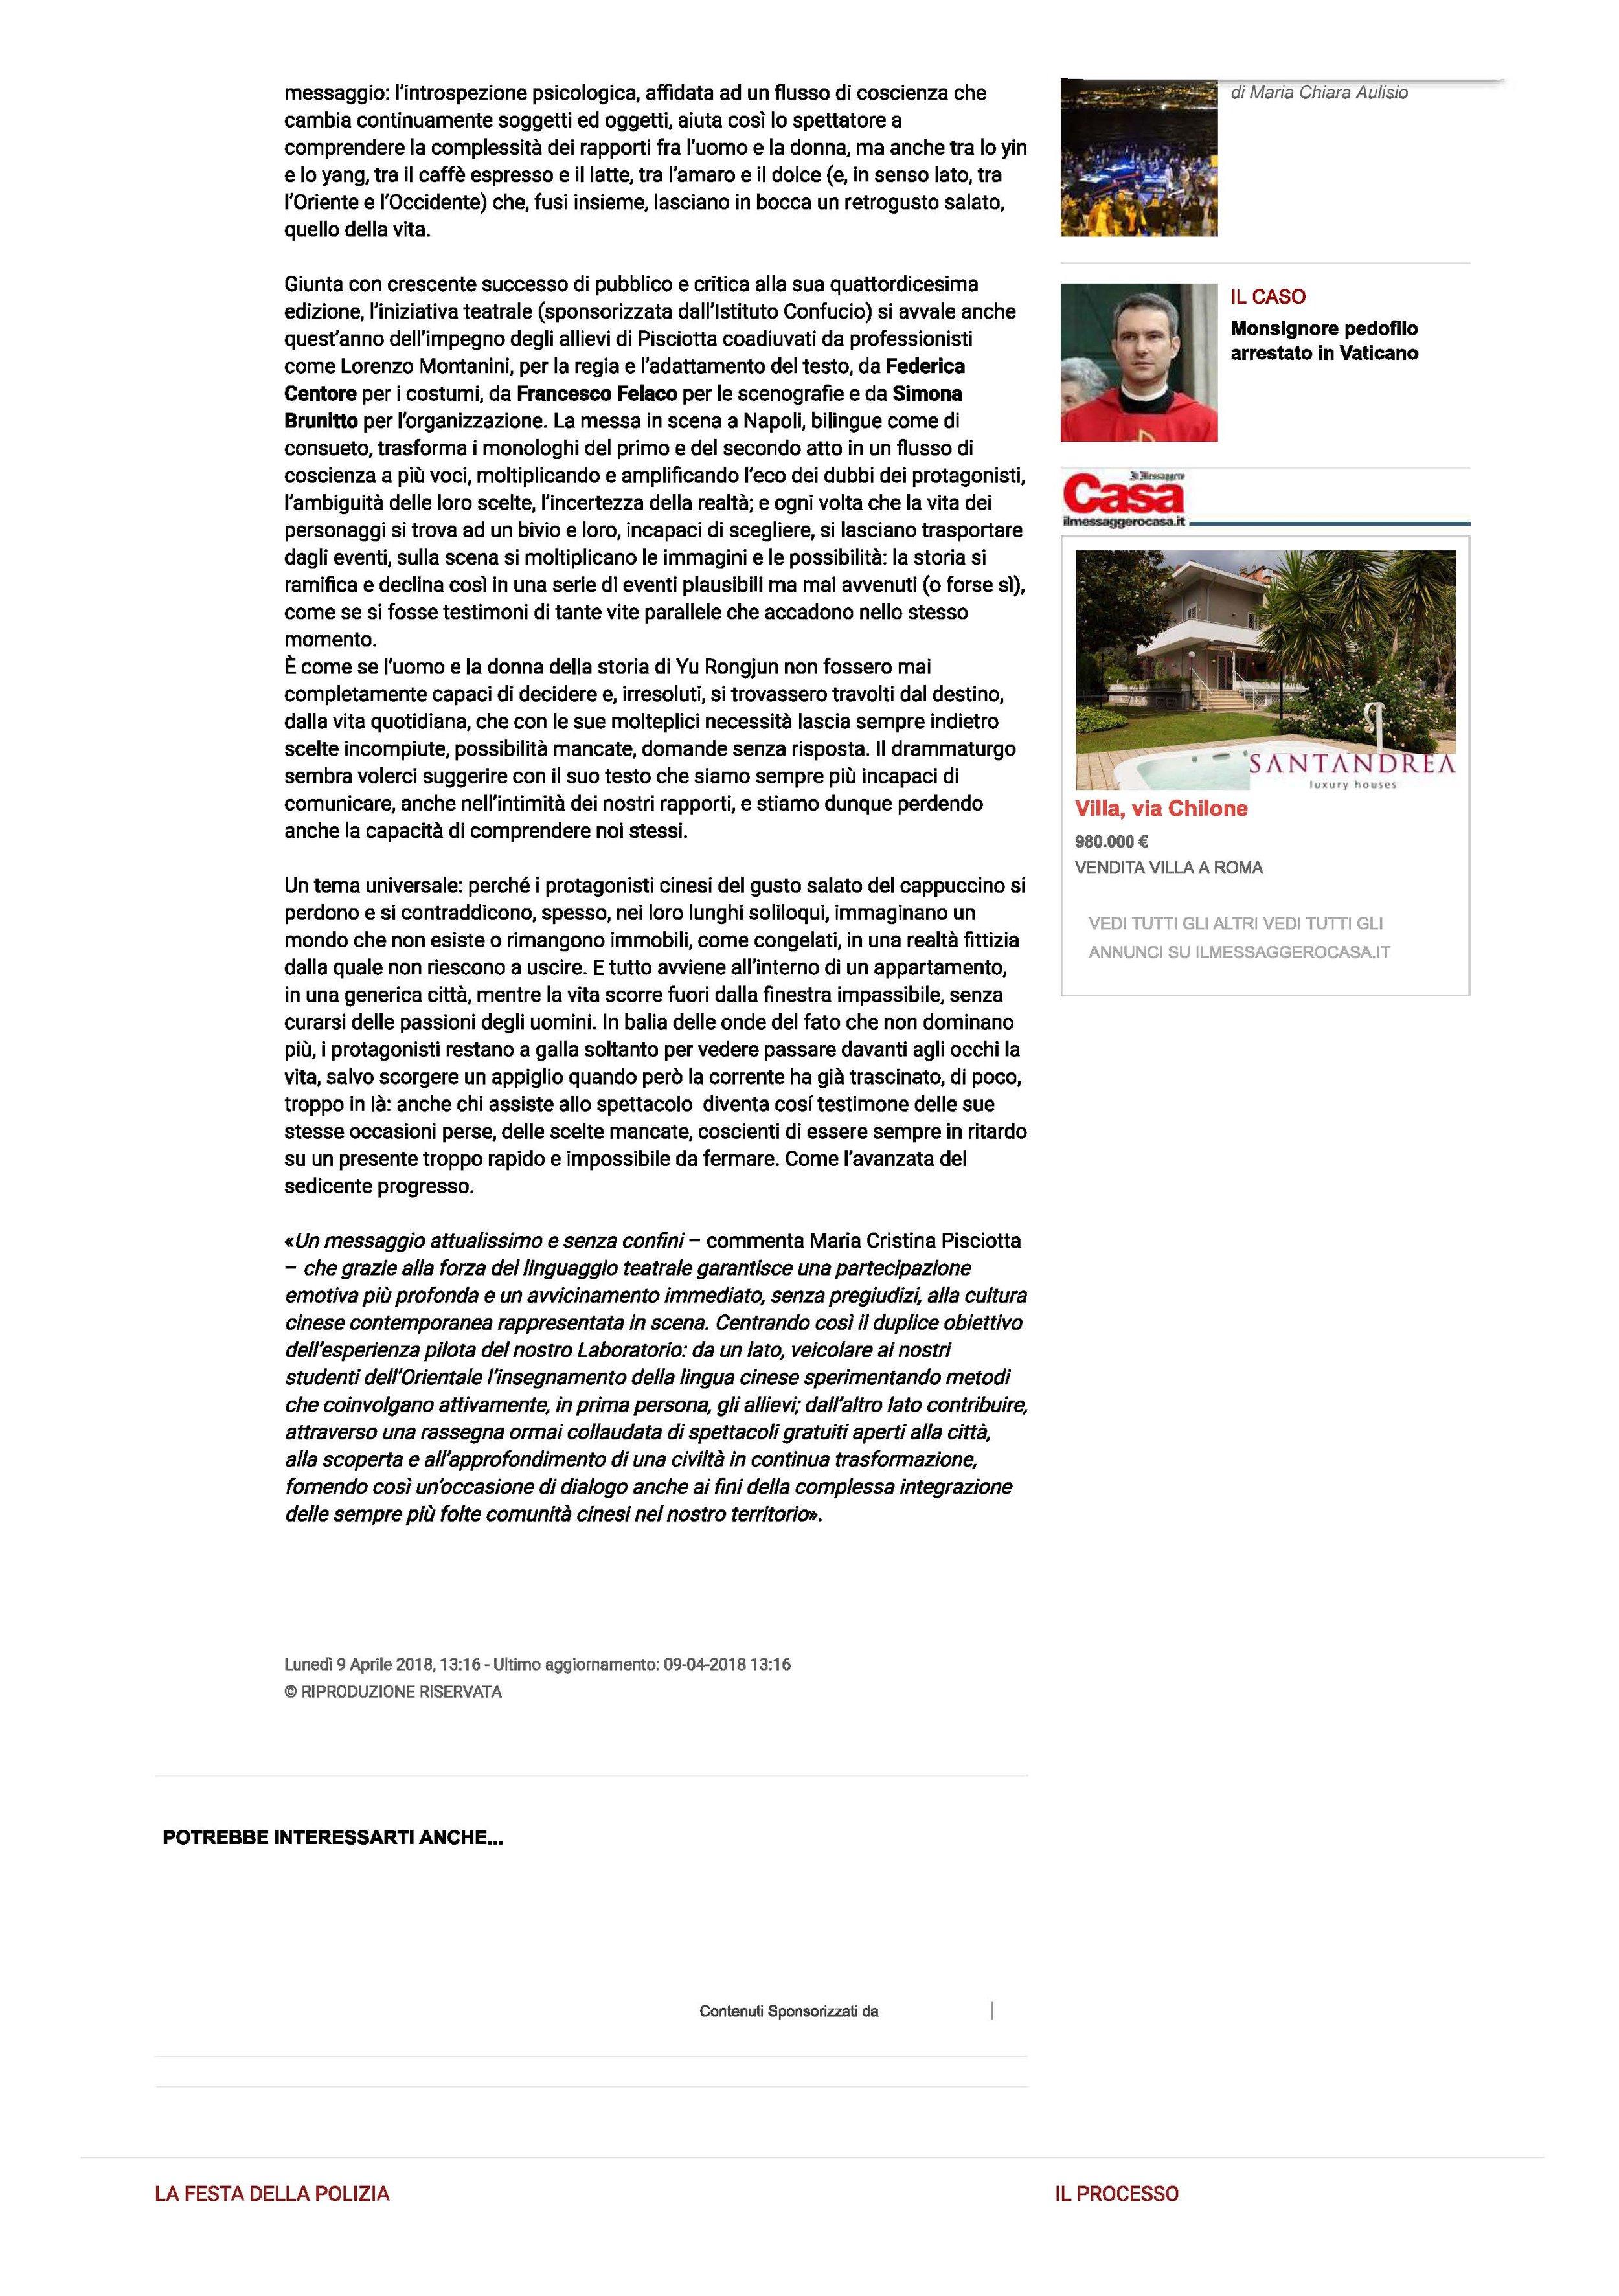 2018_04_09_mattino_it_Pagina_2.jpg